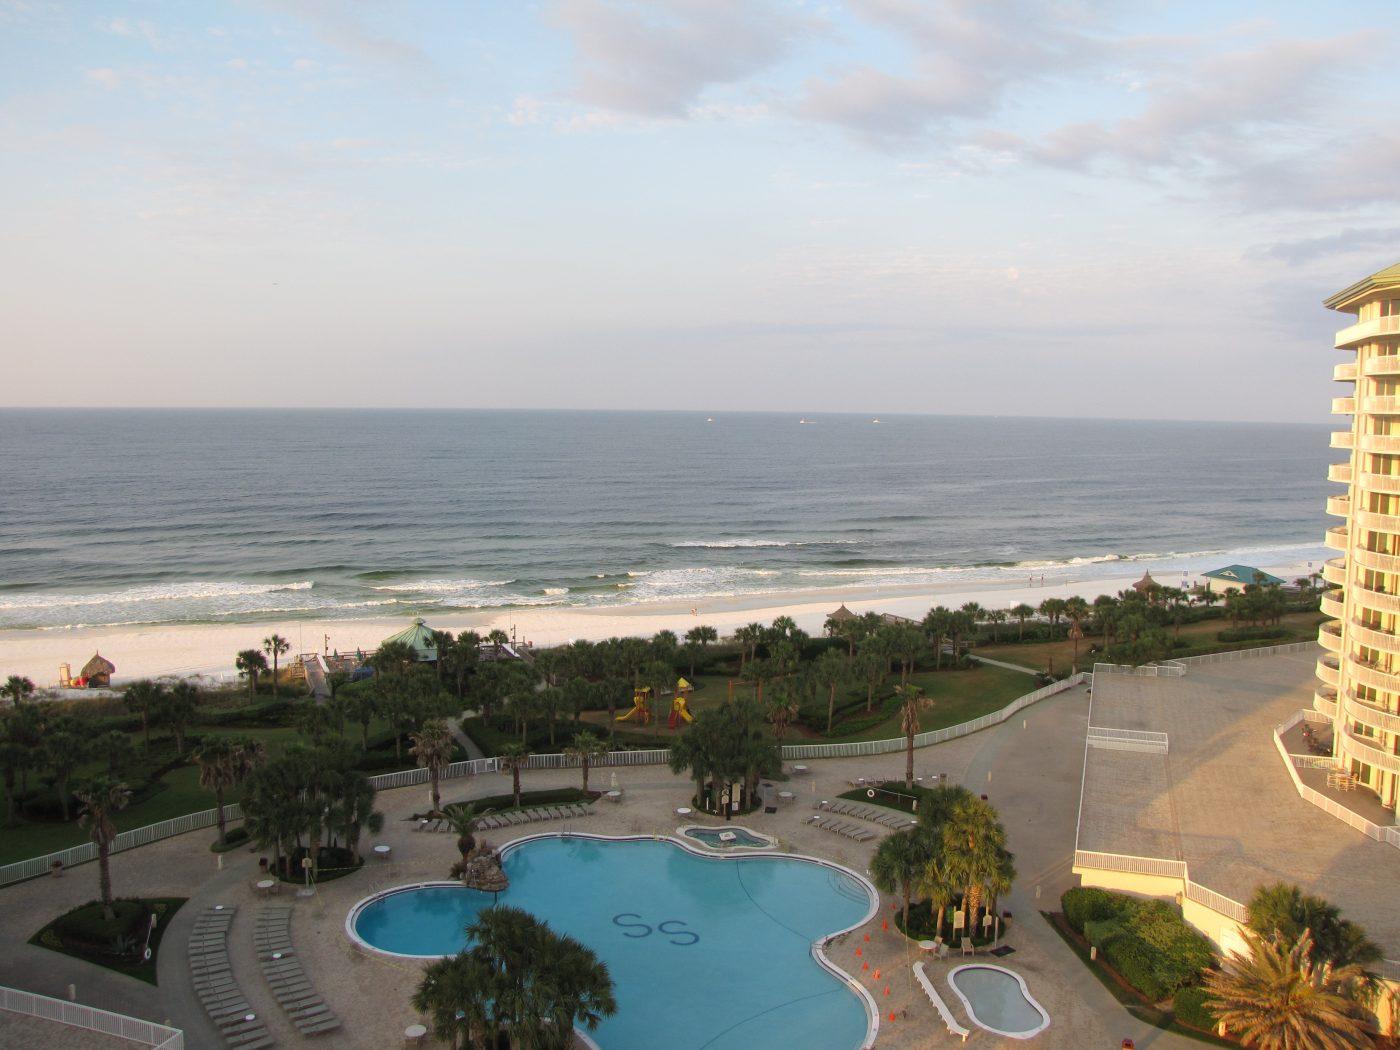 Silver Shells Beach Resort and Spa Destin Florida